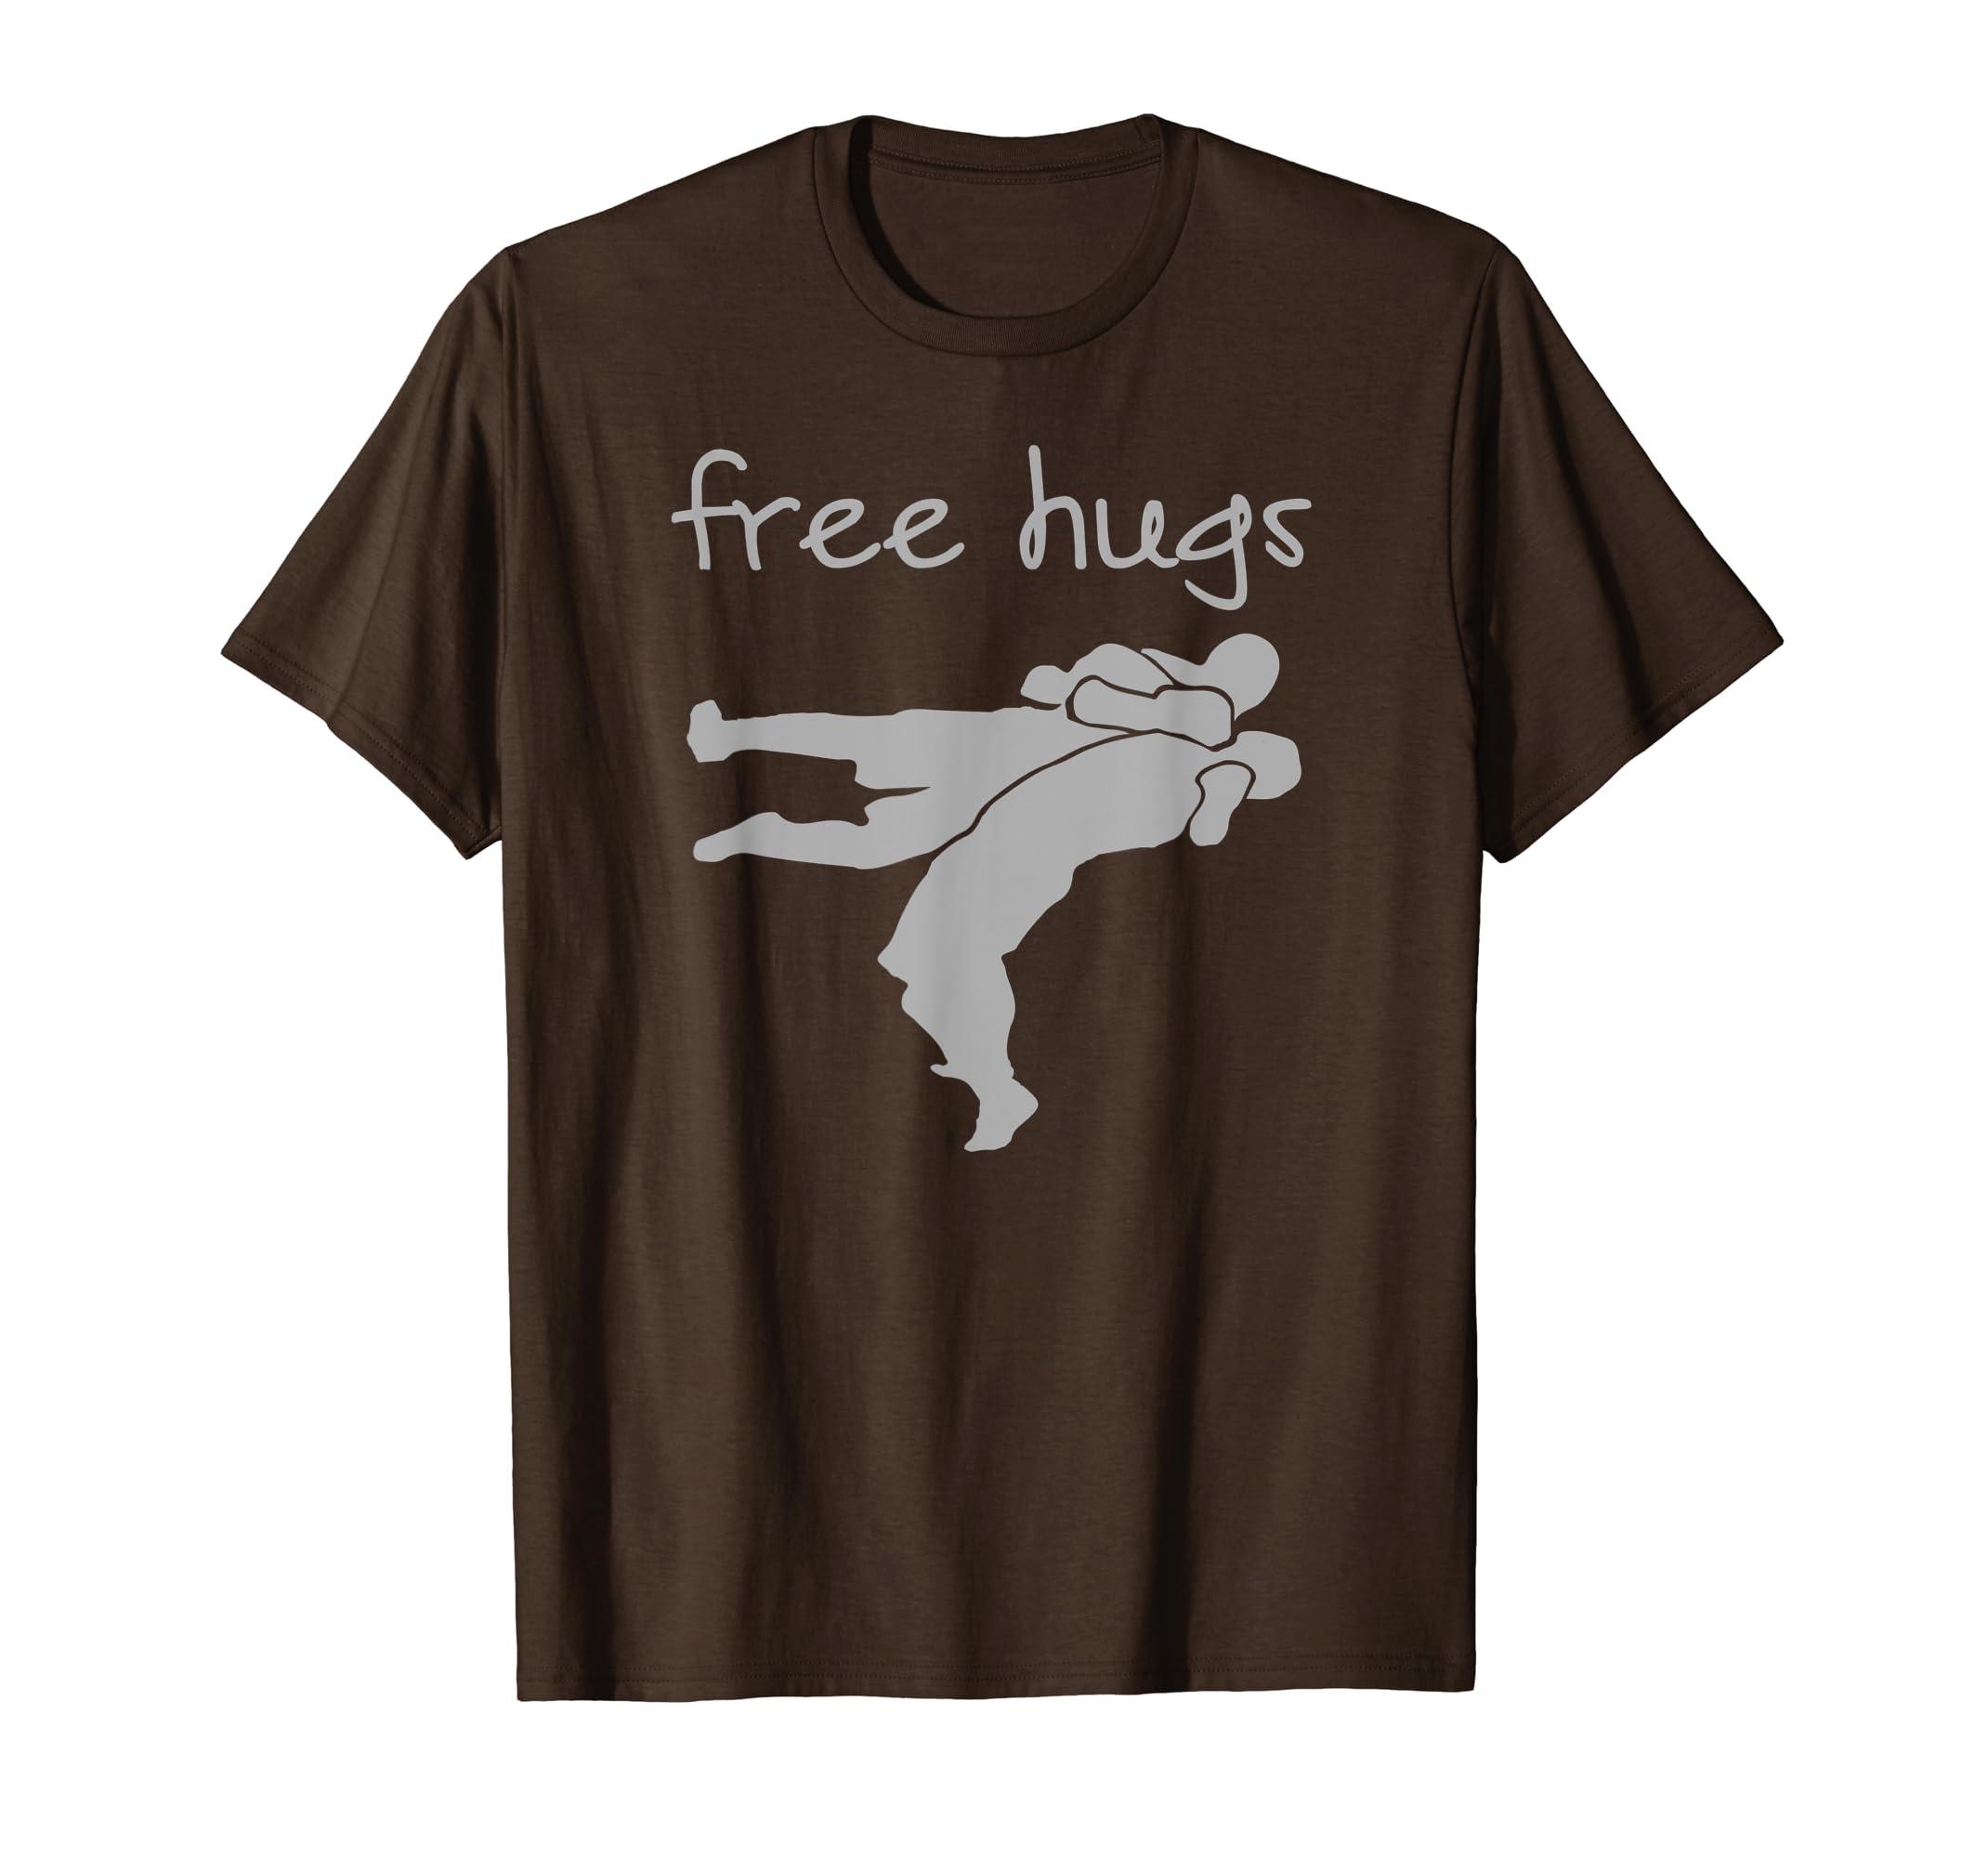 33d2e1afb9 Amazon.com: Funny Wrestling T-shirt: Clothing